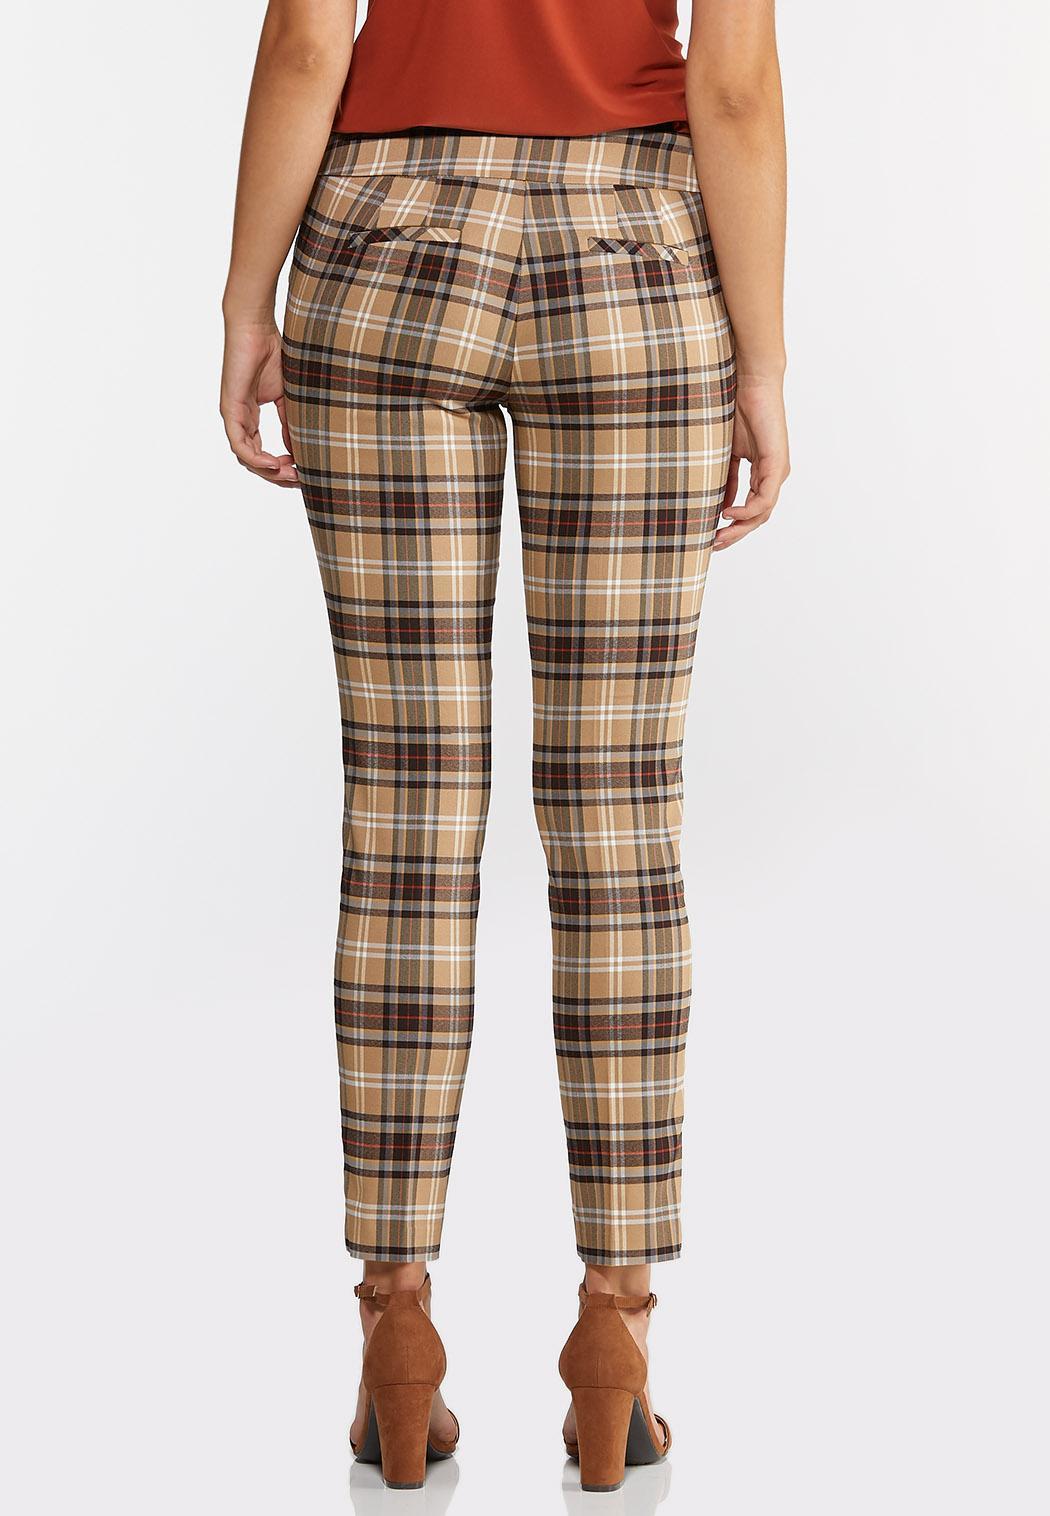 Khaki Plaid Bengaline Pants (Item #44313568)